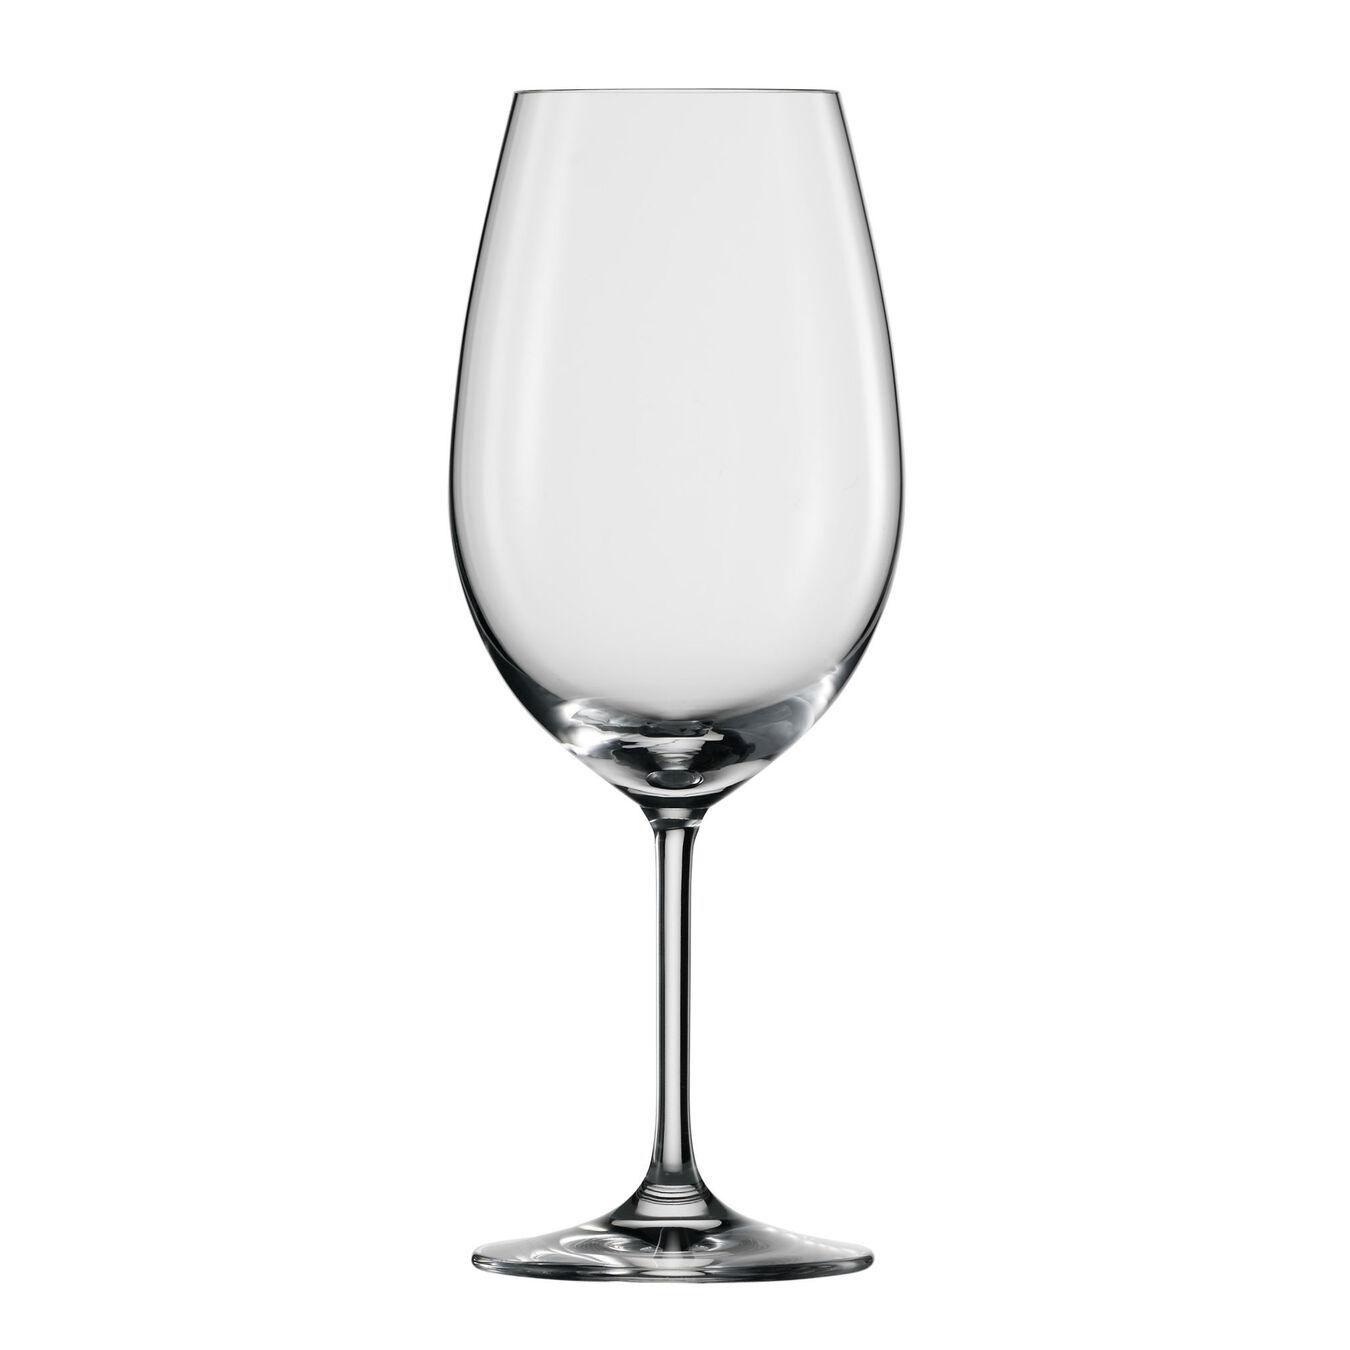 Taça para vinho tinto 630 ml,,large 1